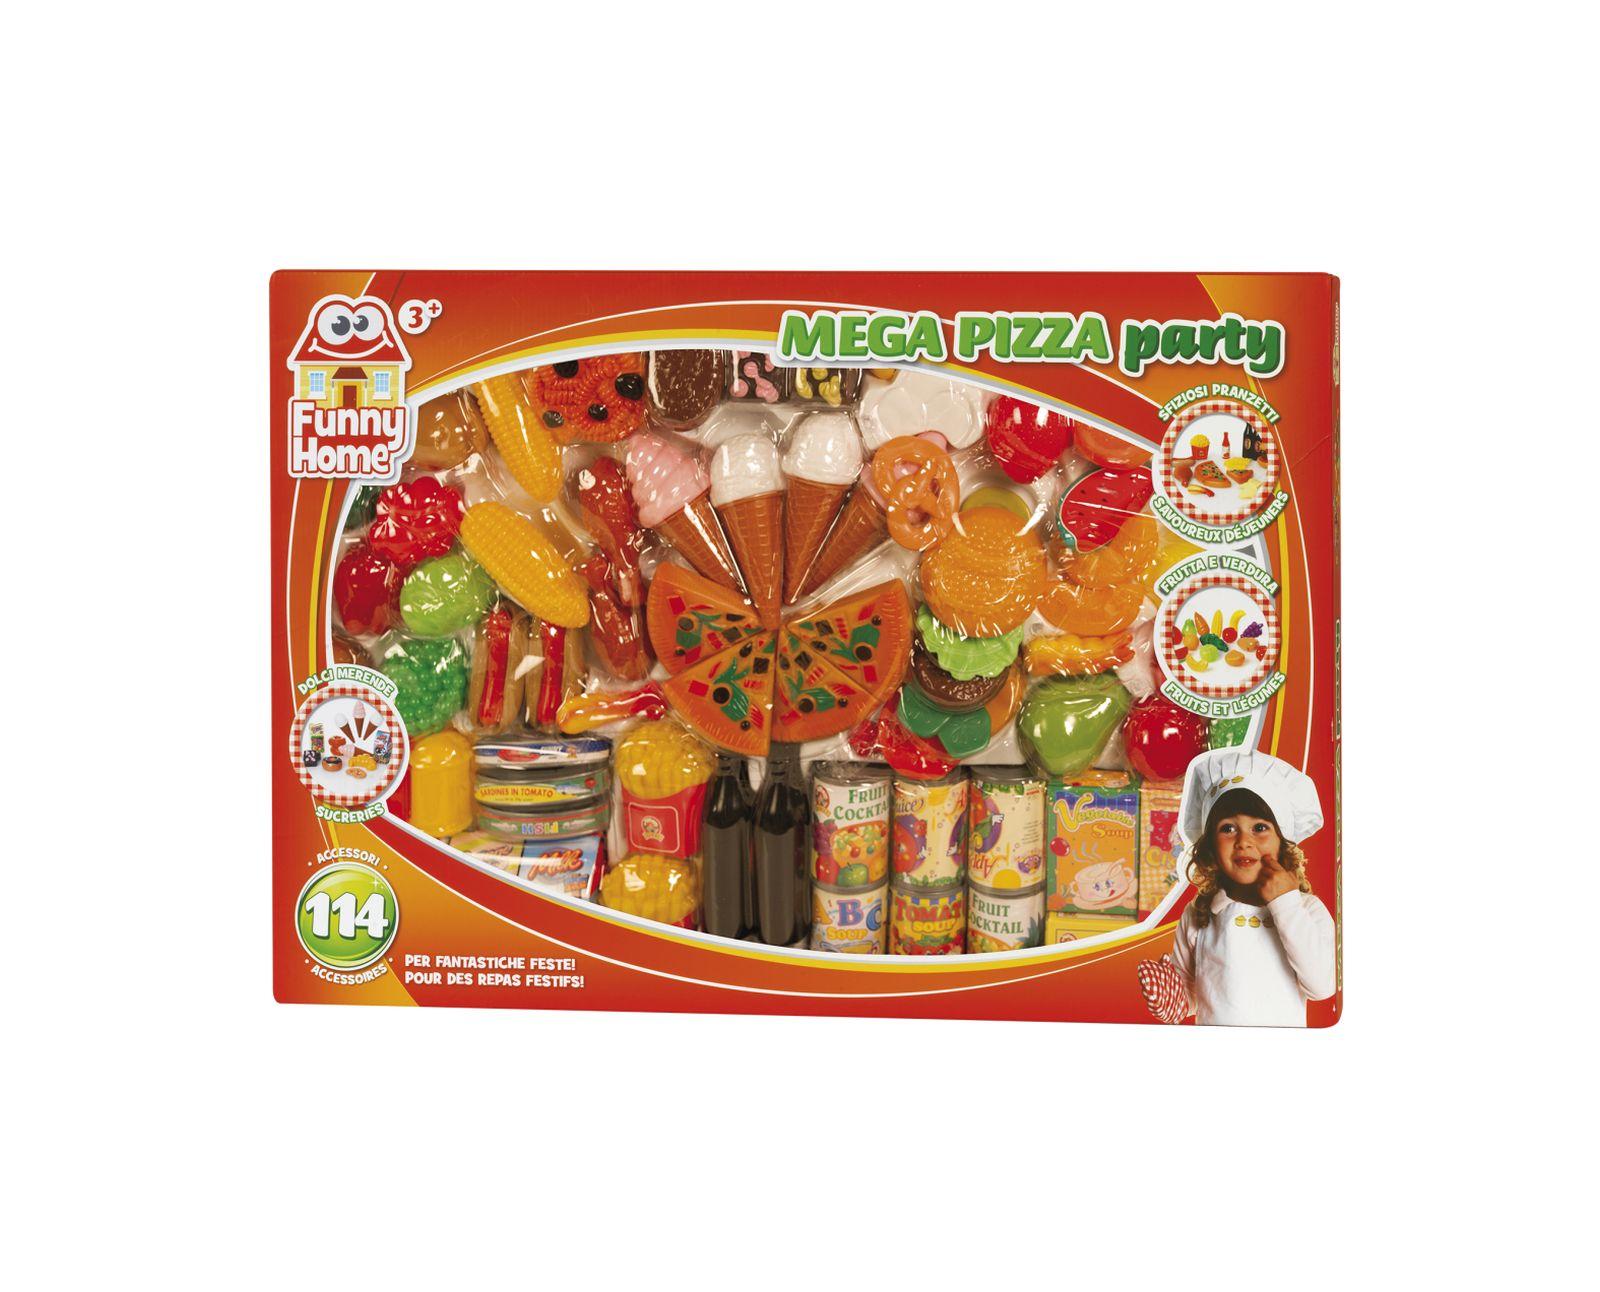 Mega pizza party - FUNNY HOME